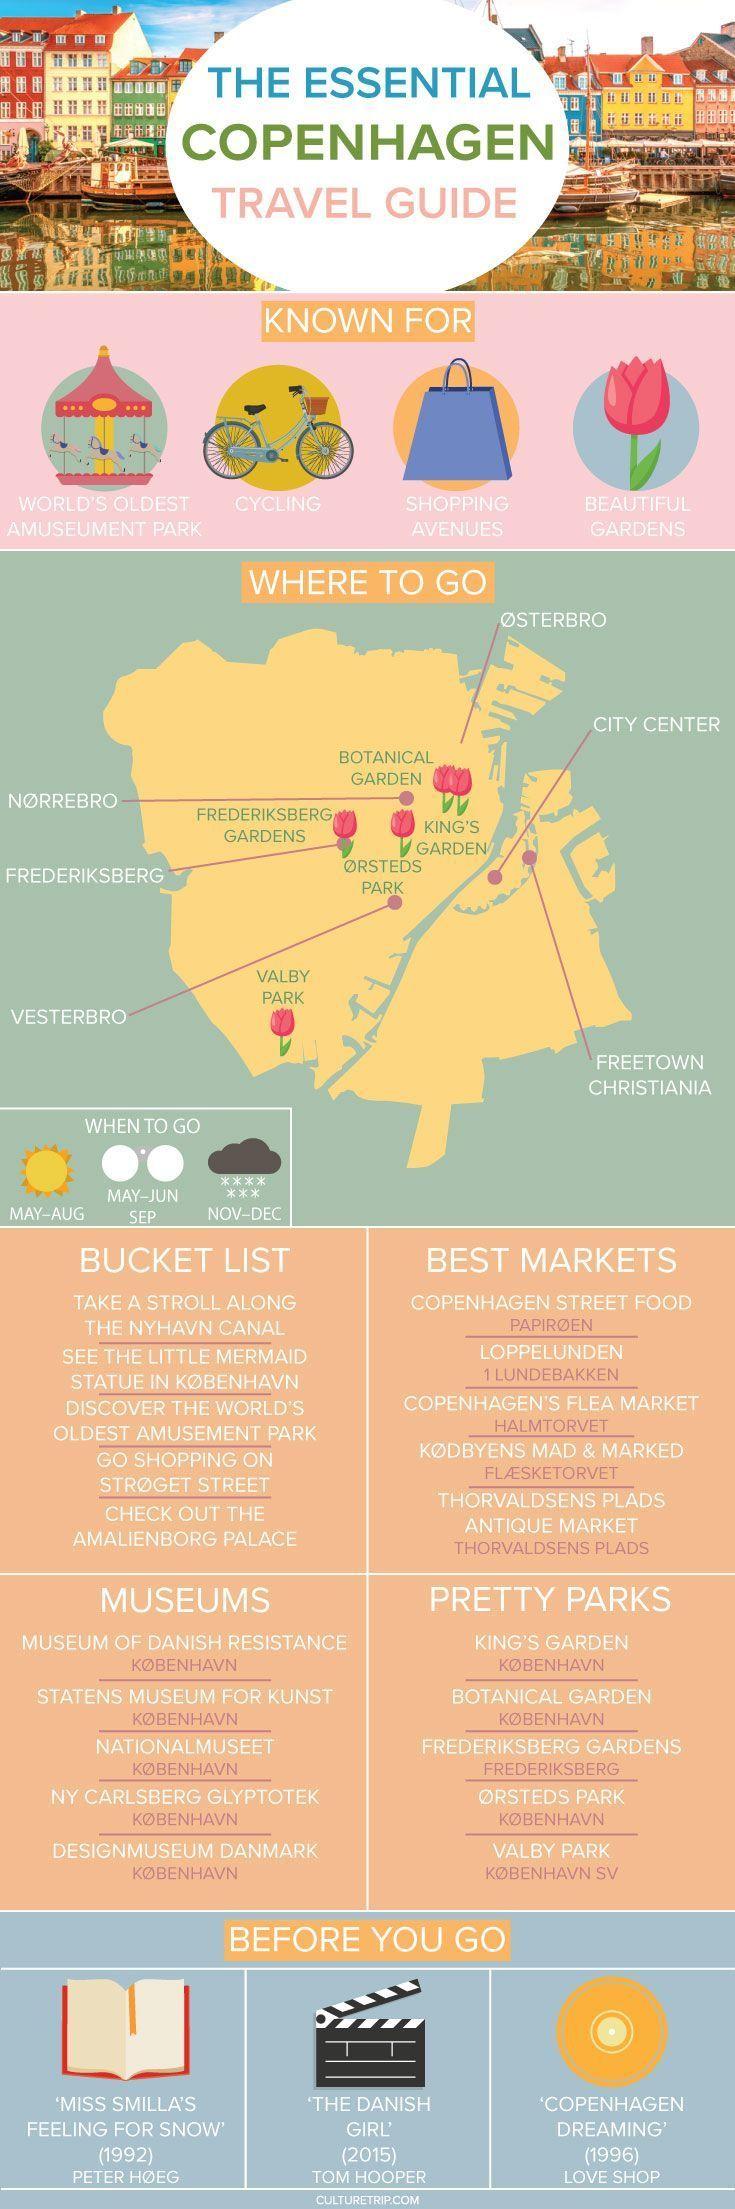 The Essential Travel Guide to Copenhagen (Infographic)|Pinterest: @theculturetrip